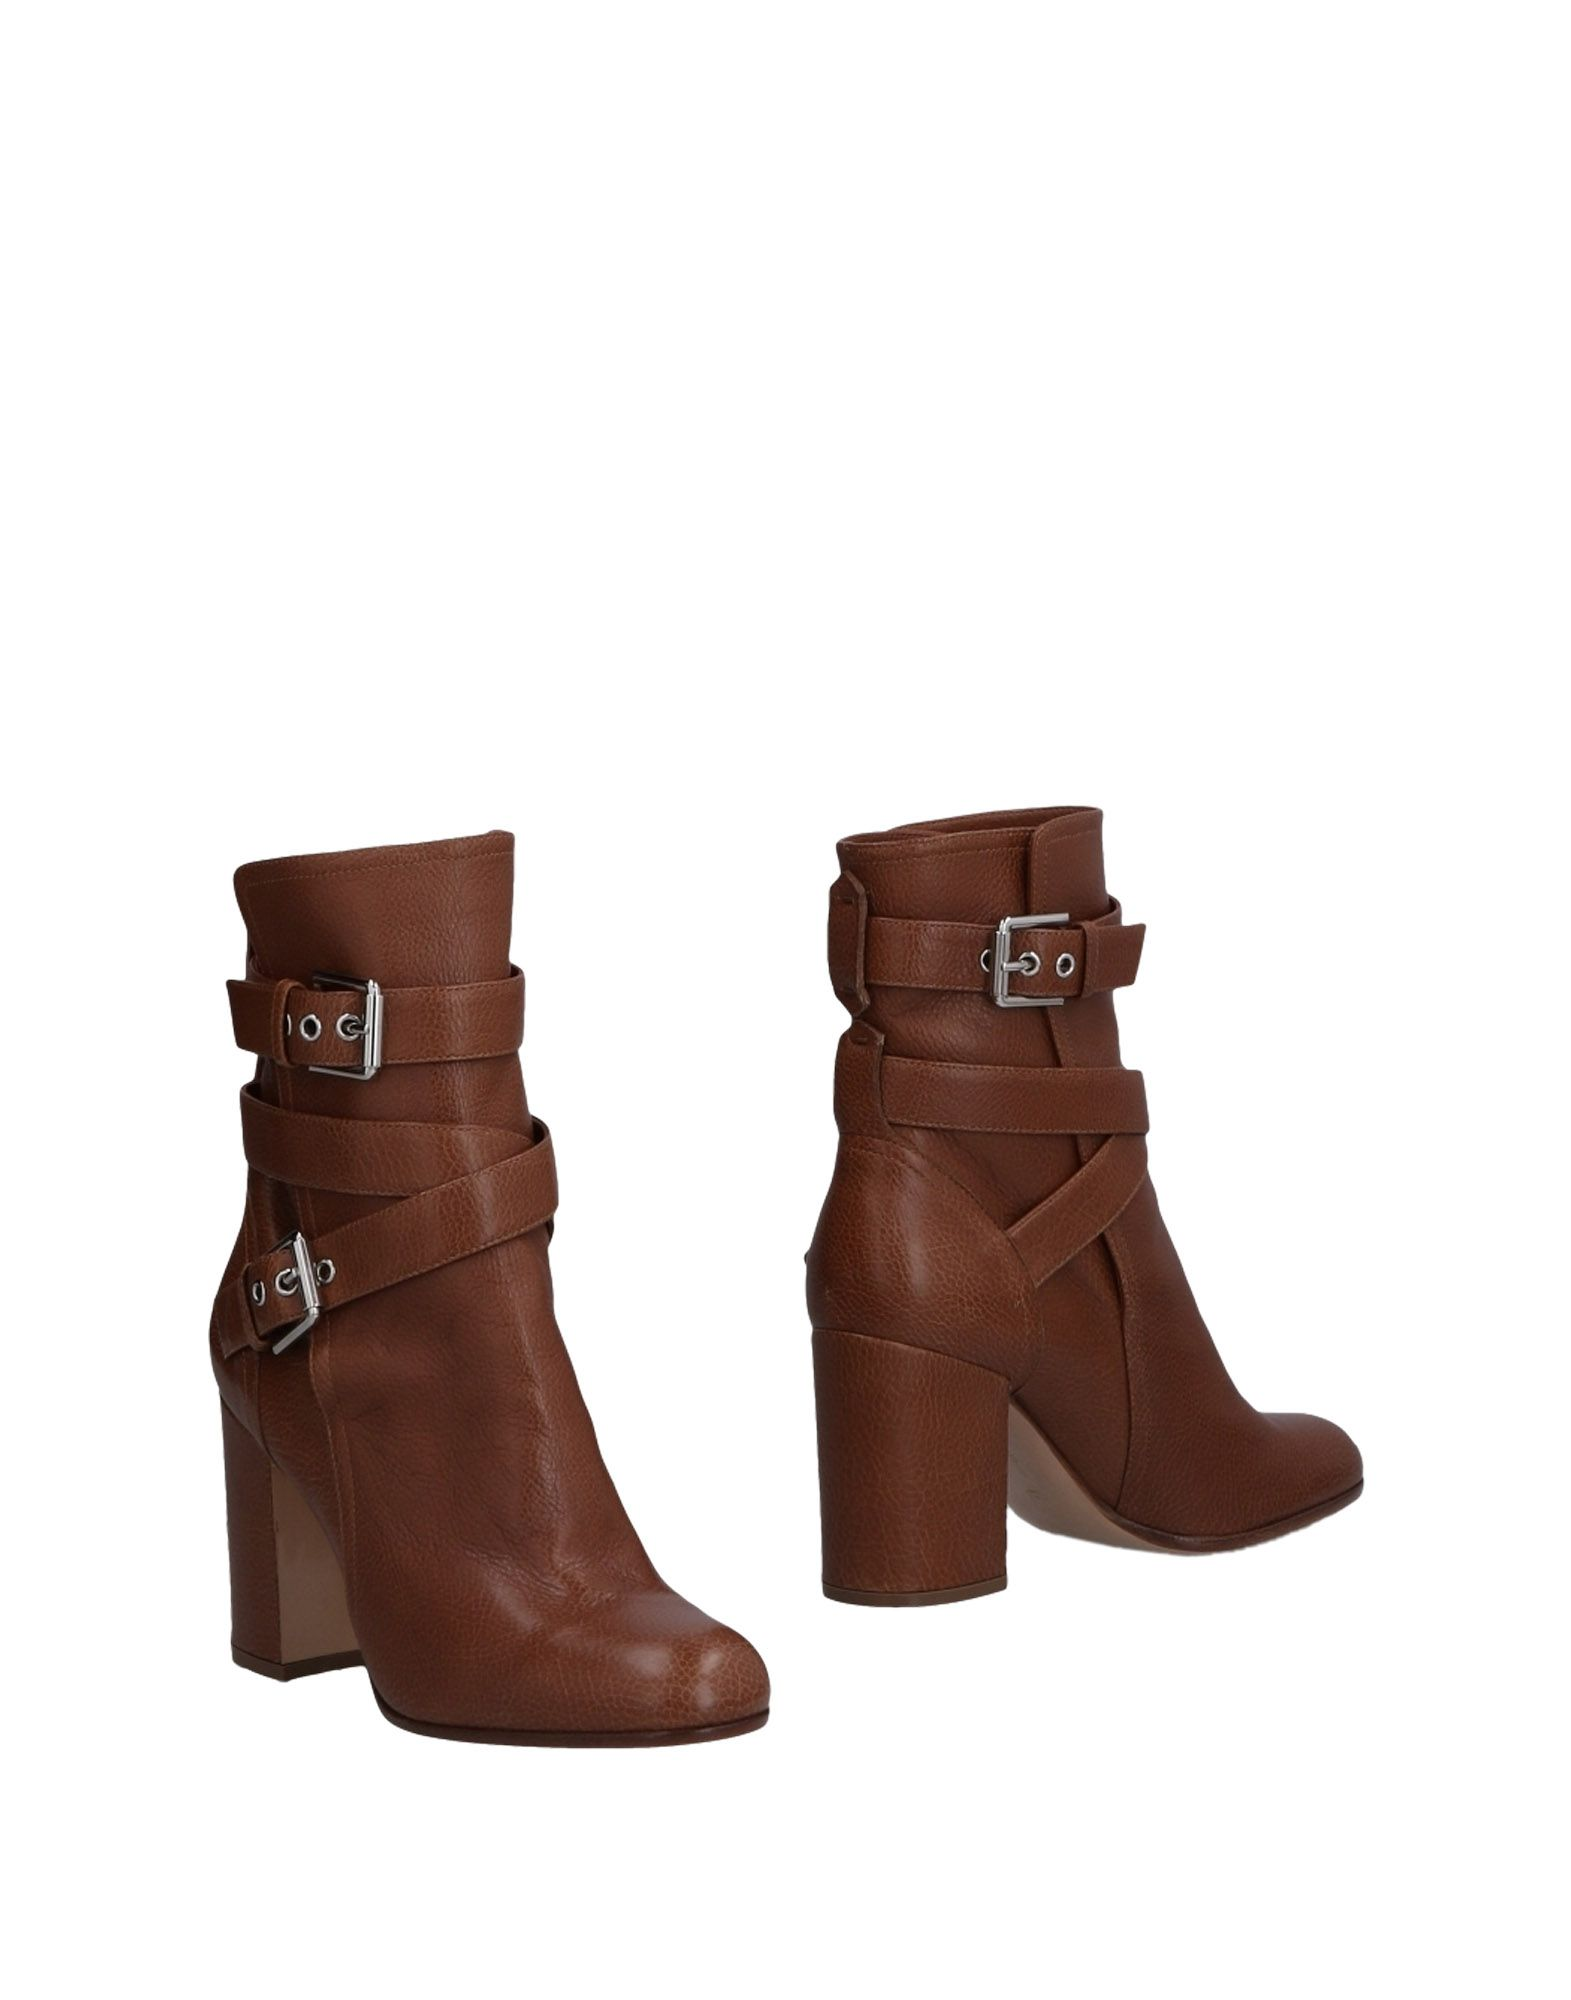 Gianvito Rossi Stiefelette aussehende Damen  11475661BIGünstige gut aussehende Stiefelette Schuhe c4c80f